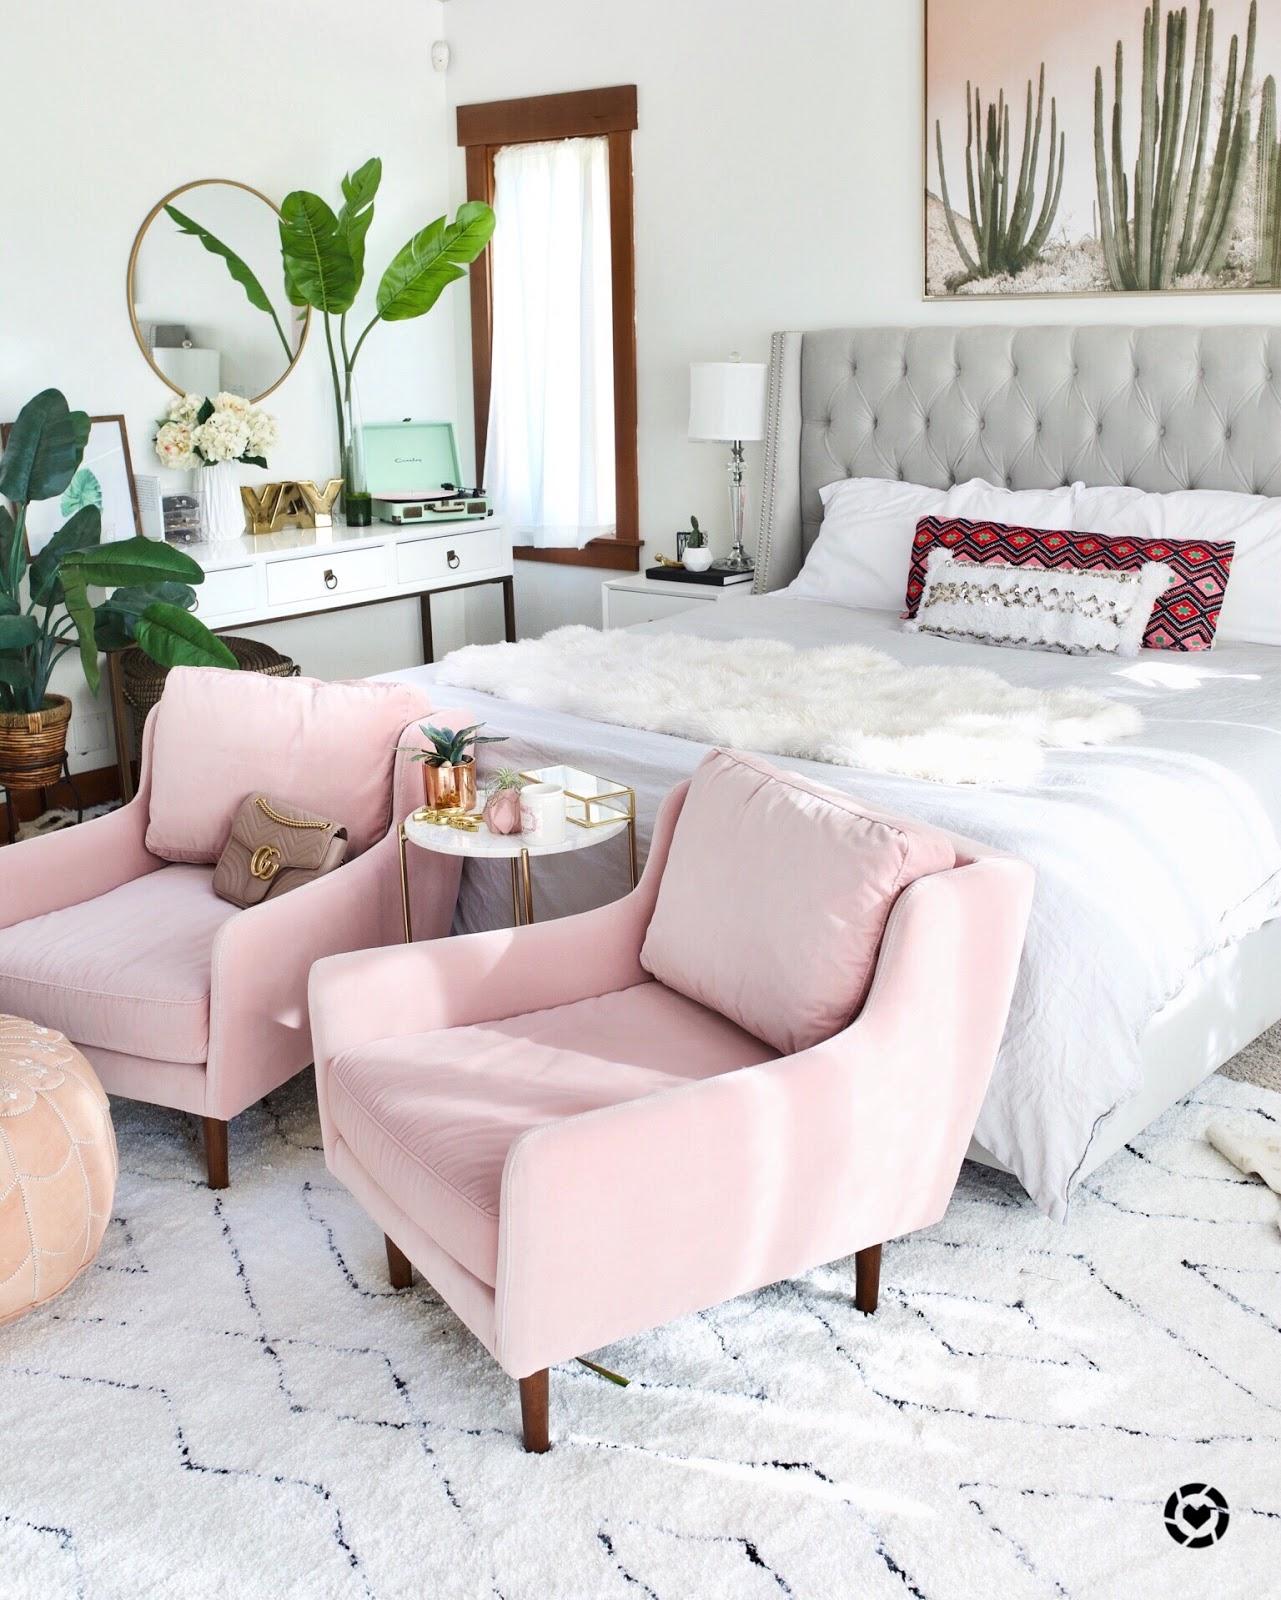 Blush Pink Chairs